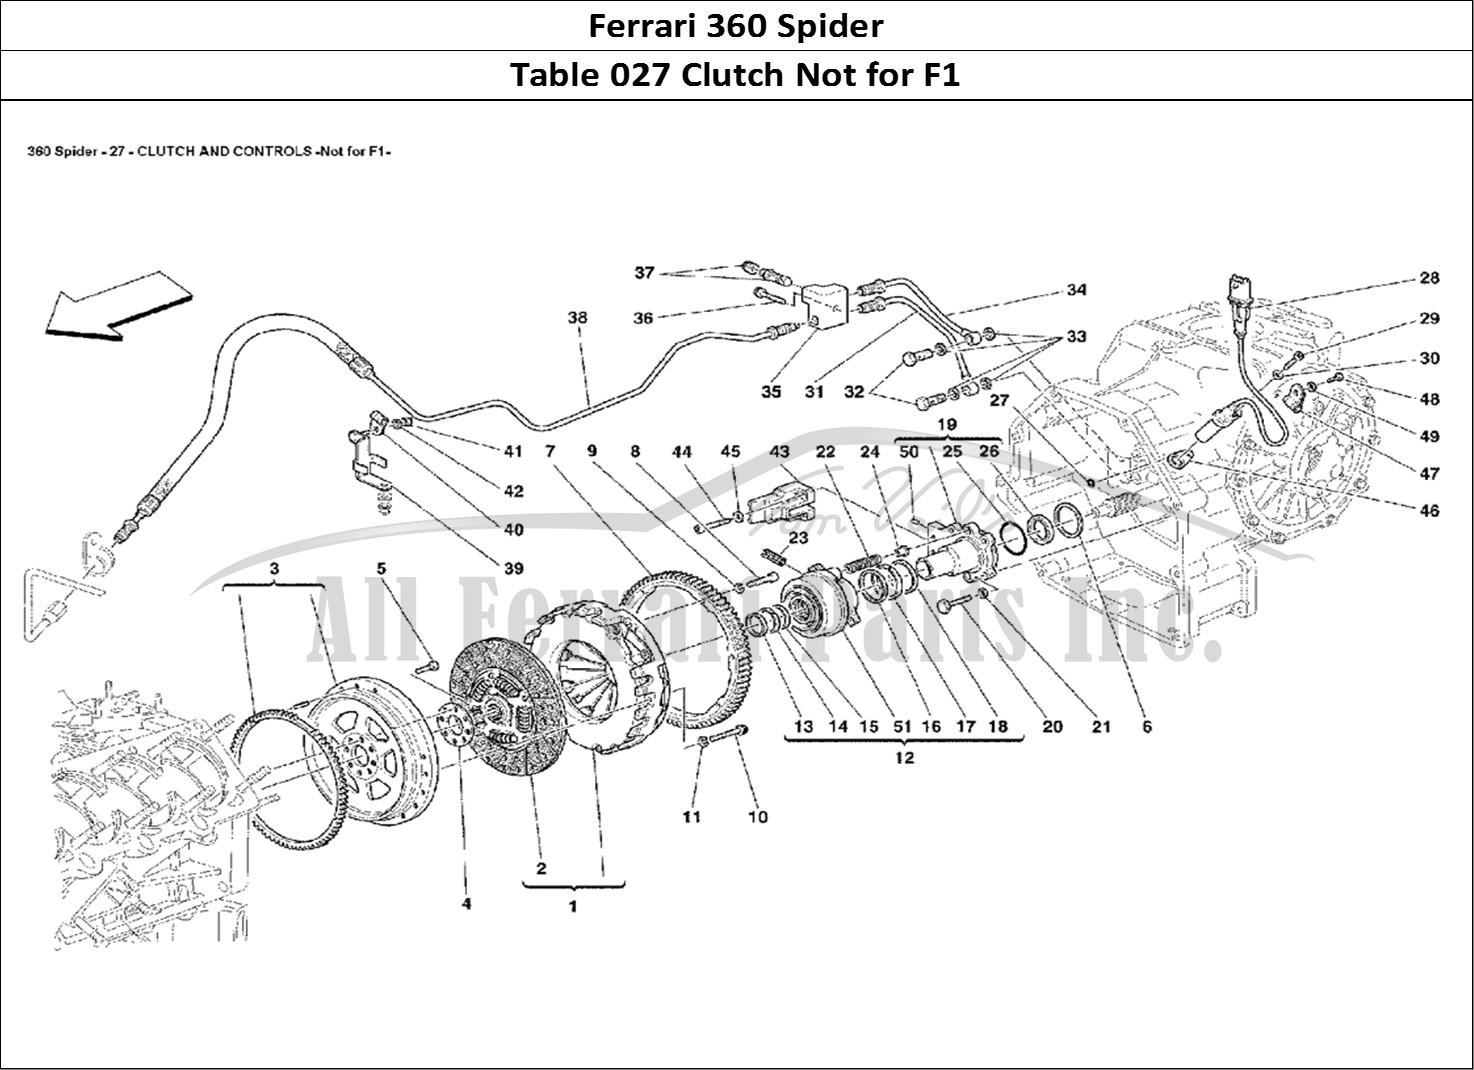 Buy Original Ferrari 360 Spider 027 Clutch Not For F1 Ferrari Parts Spares Accessories Online